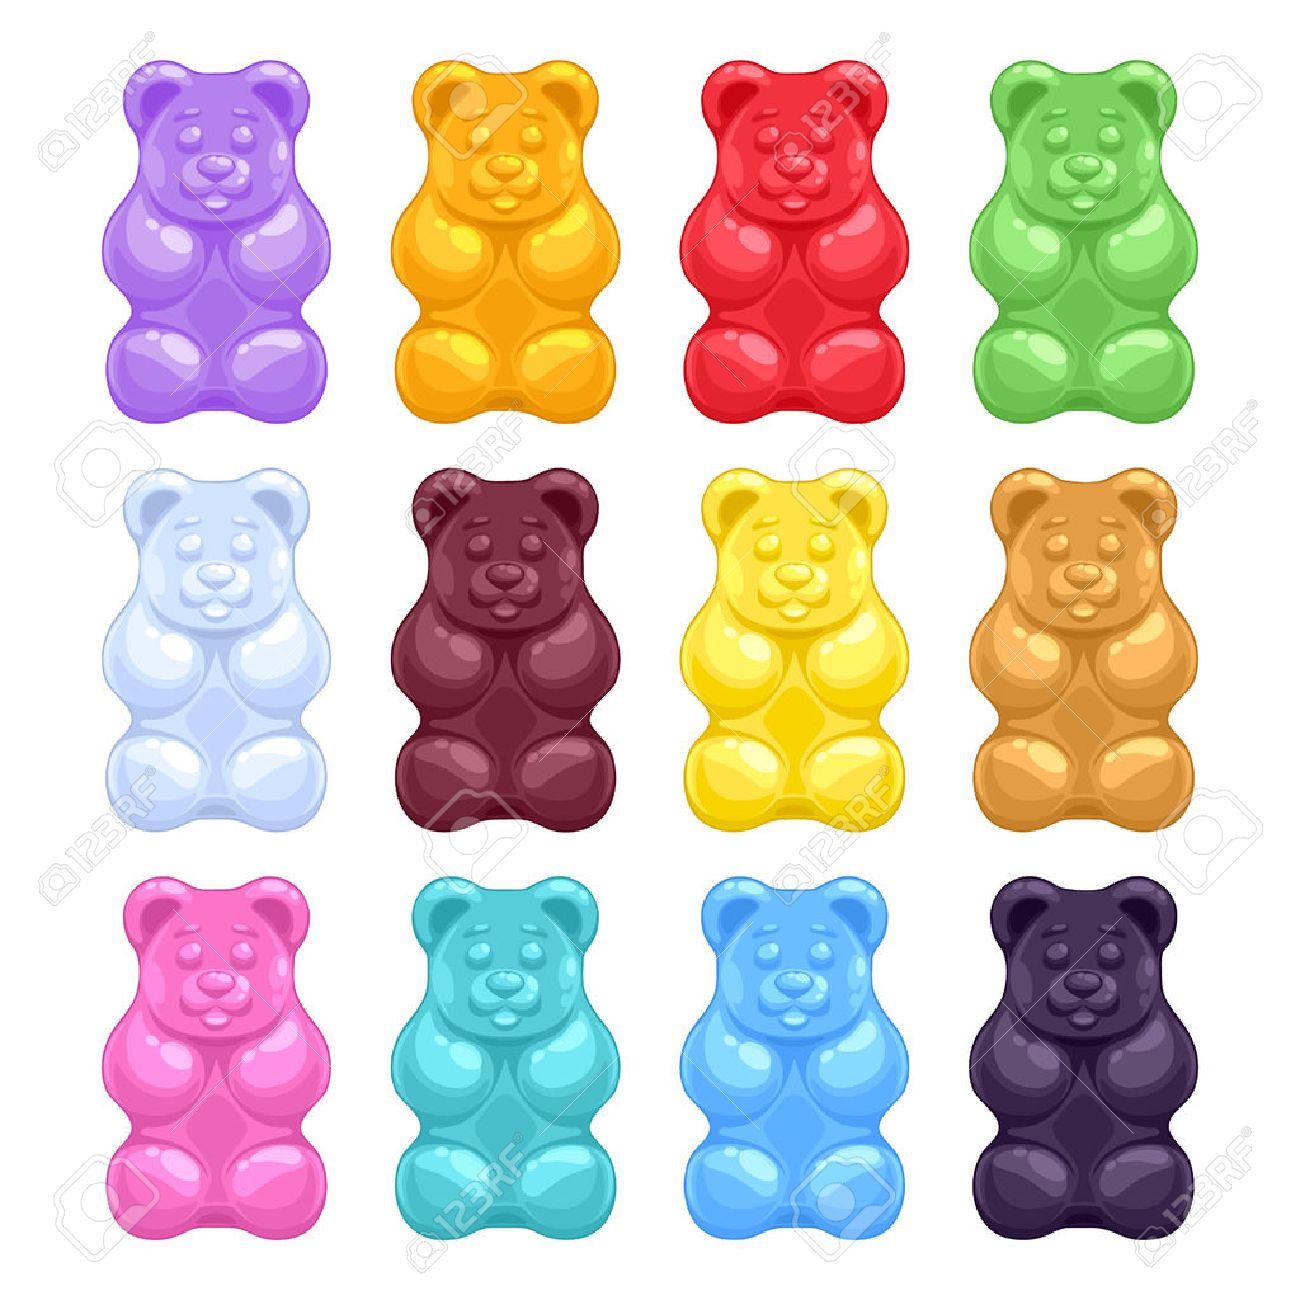 Gummy bears clipart 5 » Clipart Station.